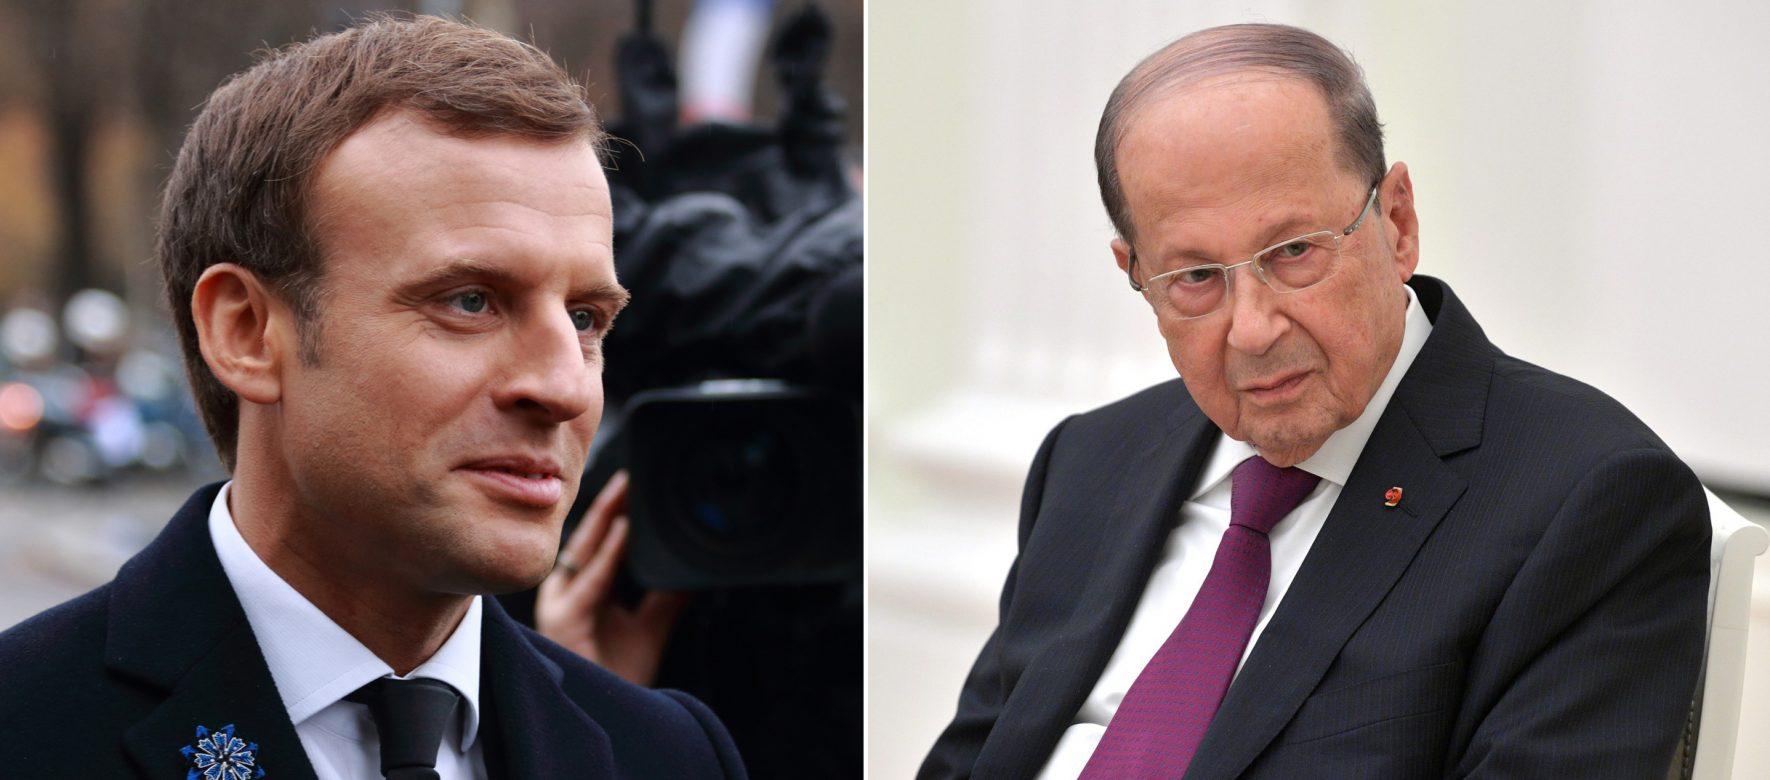 Liban : Michel Aoun a rencontré Emmanuel Macron à New York